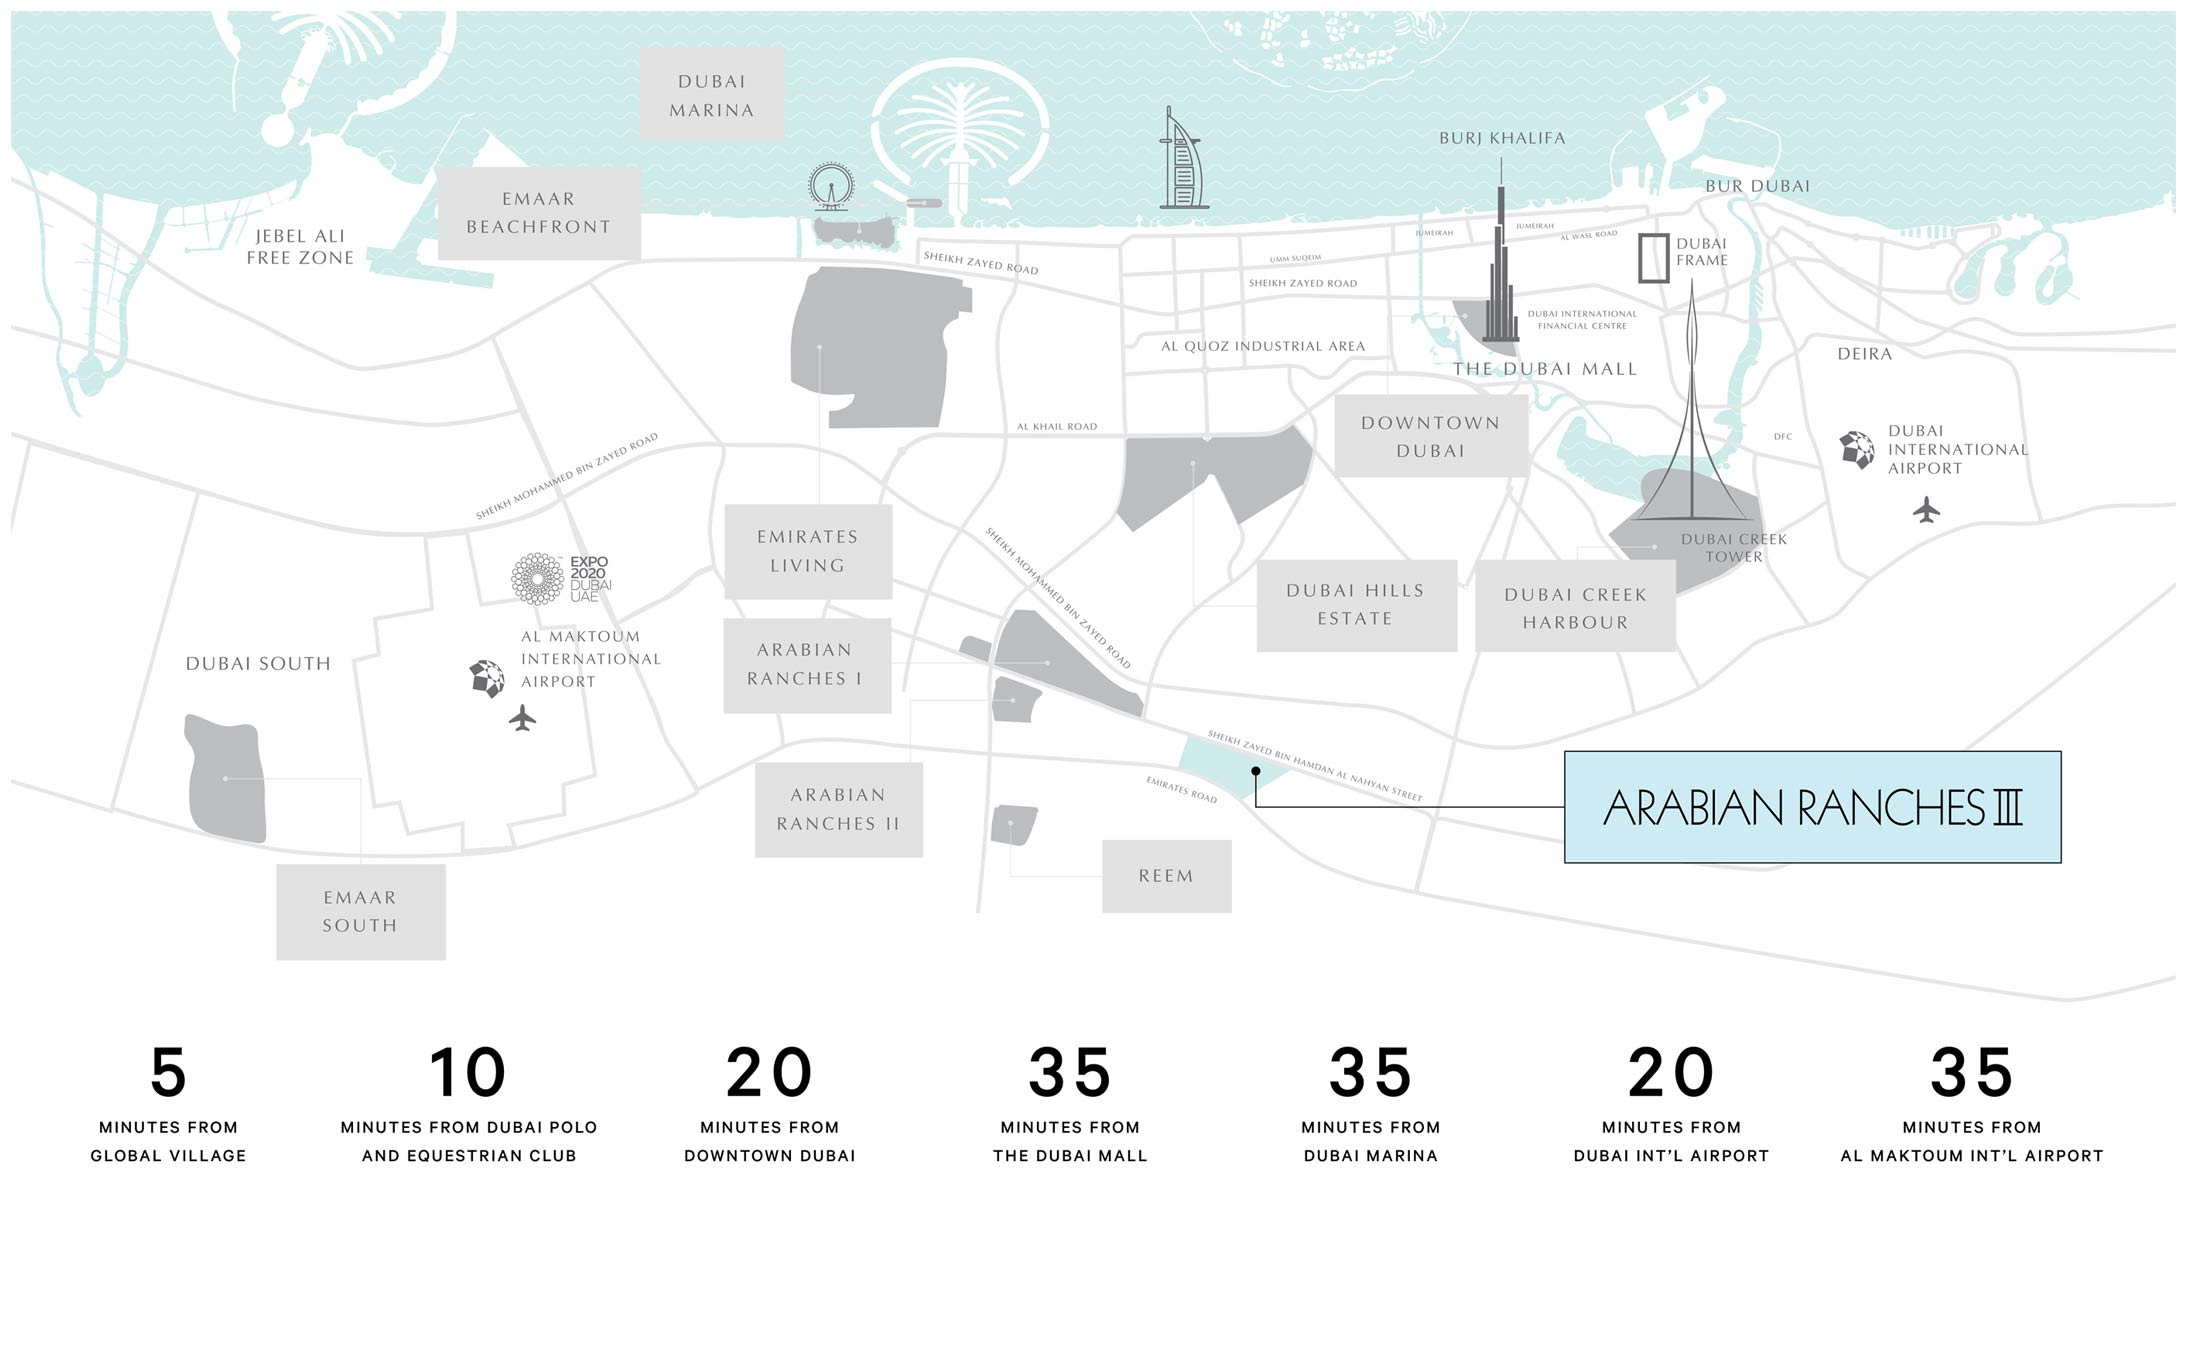 Emaar-Sun-Townhouses-at-Arabian-Ranches-III Location Map